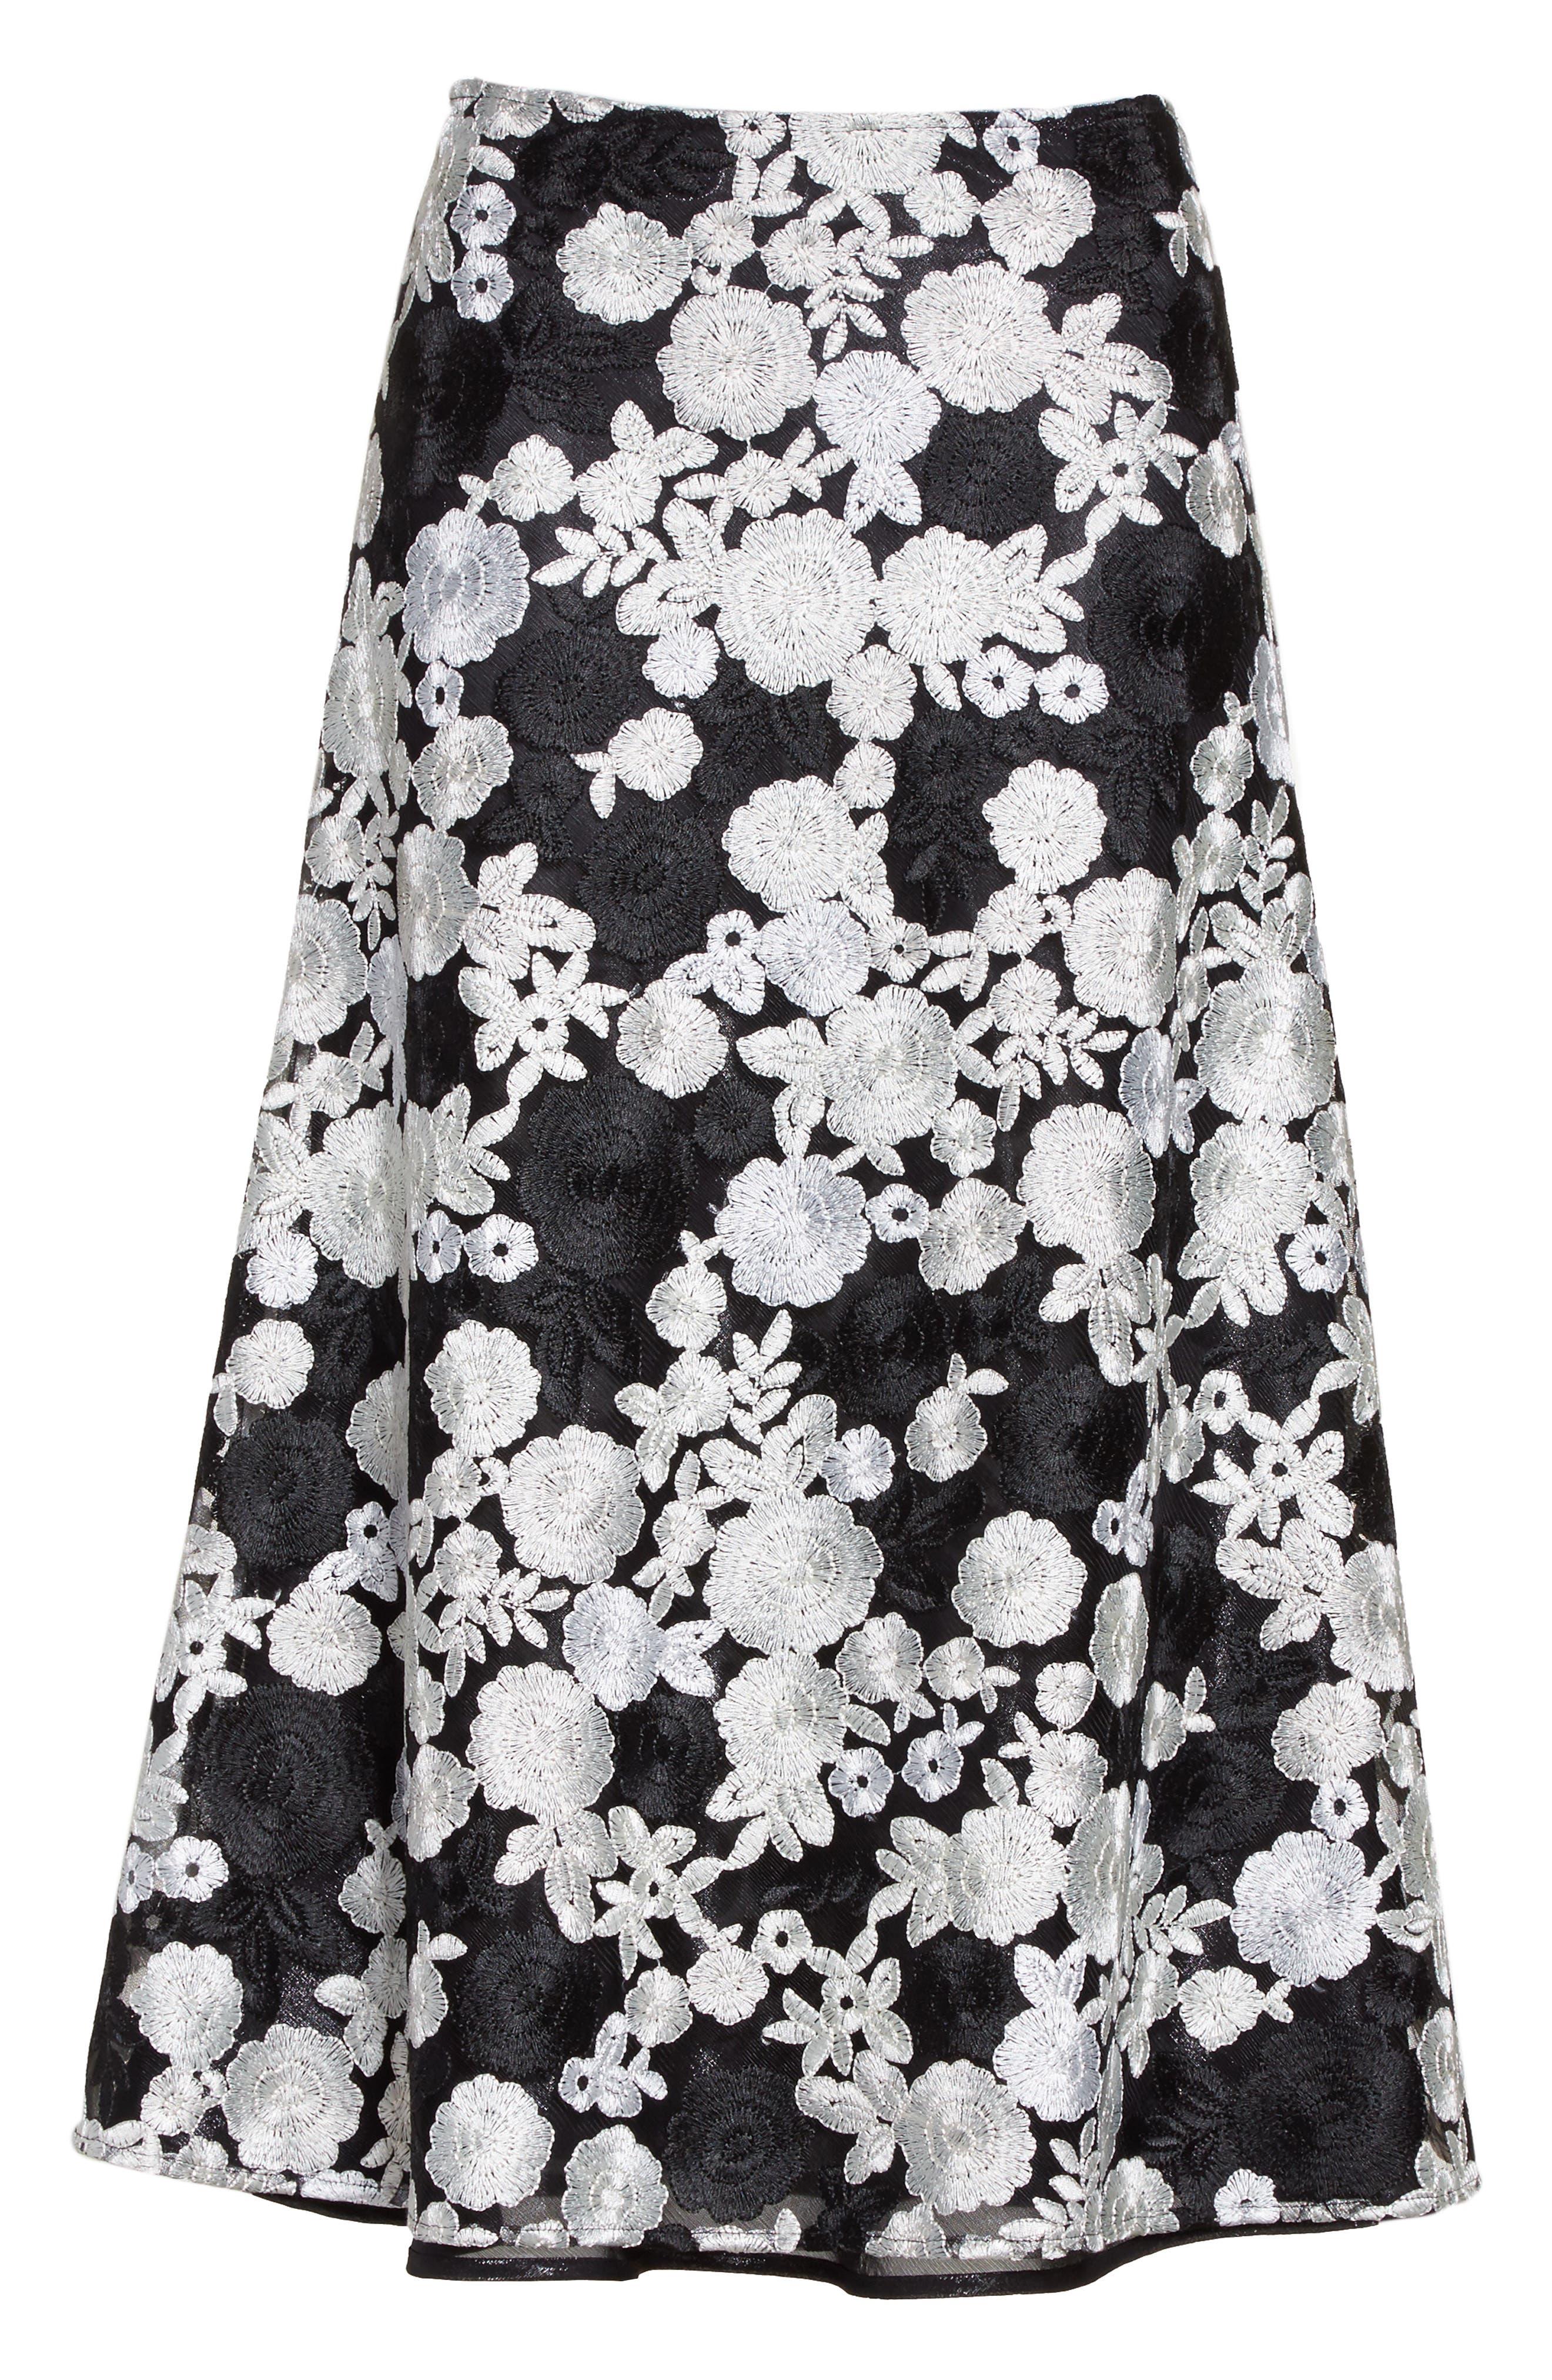 St. John Floral Embroidered Flared Skirt,                             Alternate thumbnail 7, color,                             Caviar Multi